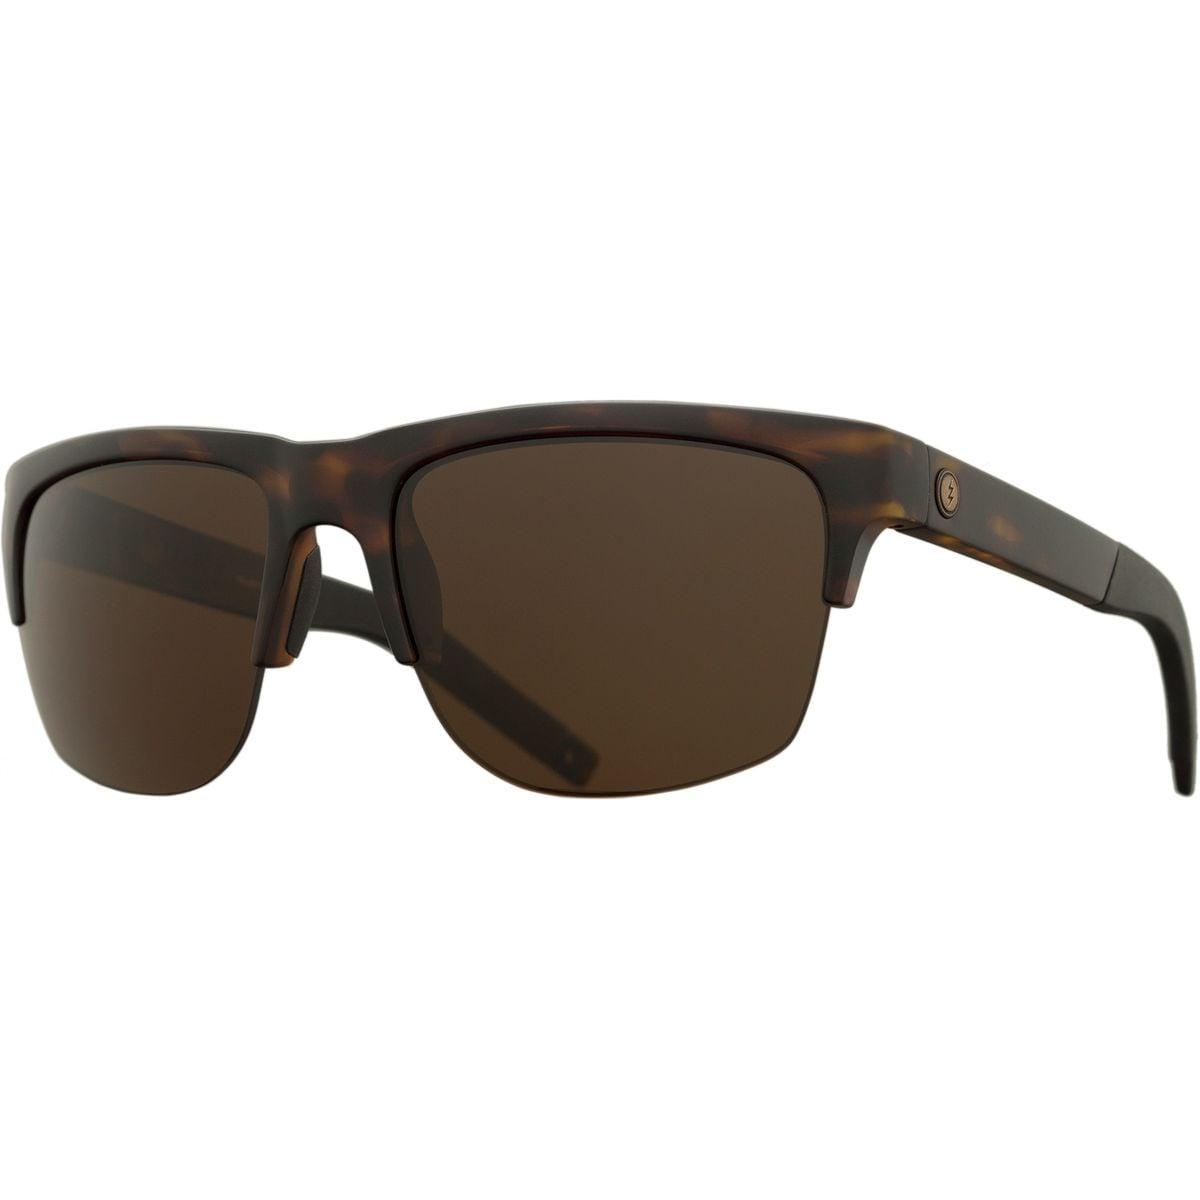 Electric Knoxville Pro Polarized Sunglasses - Men's